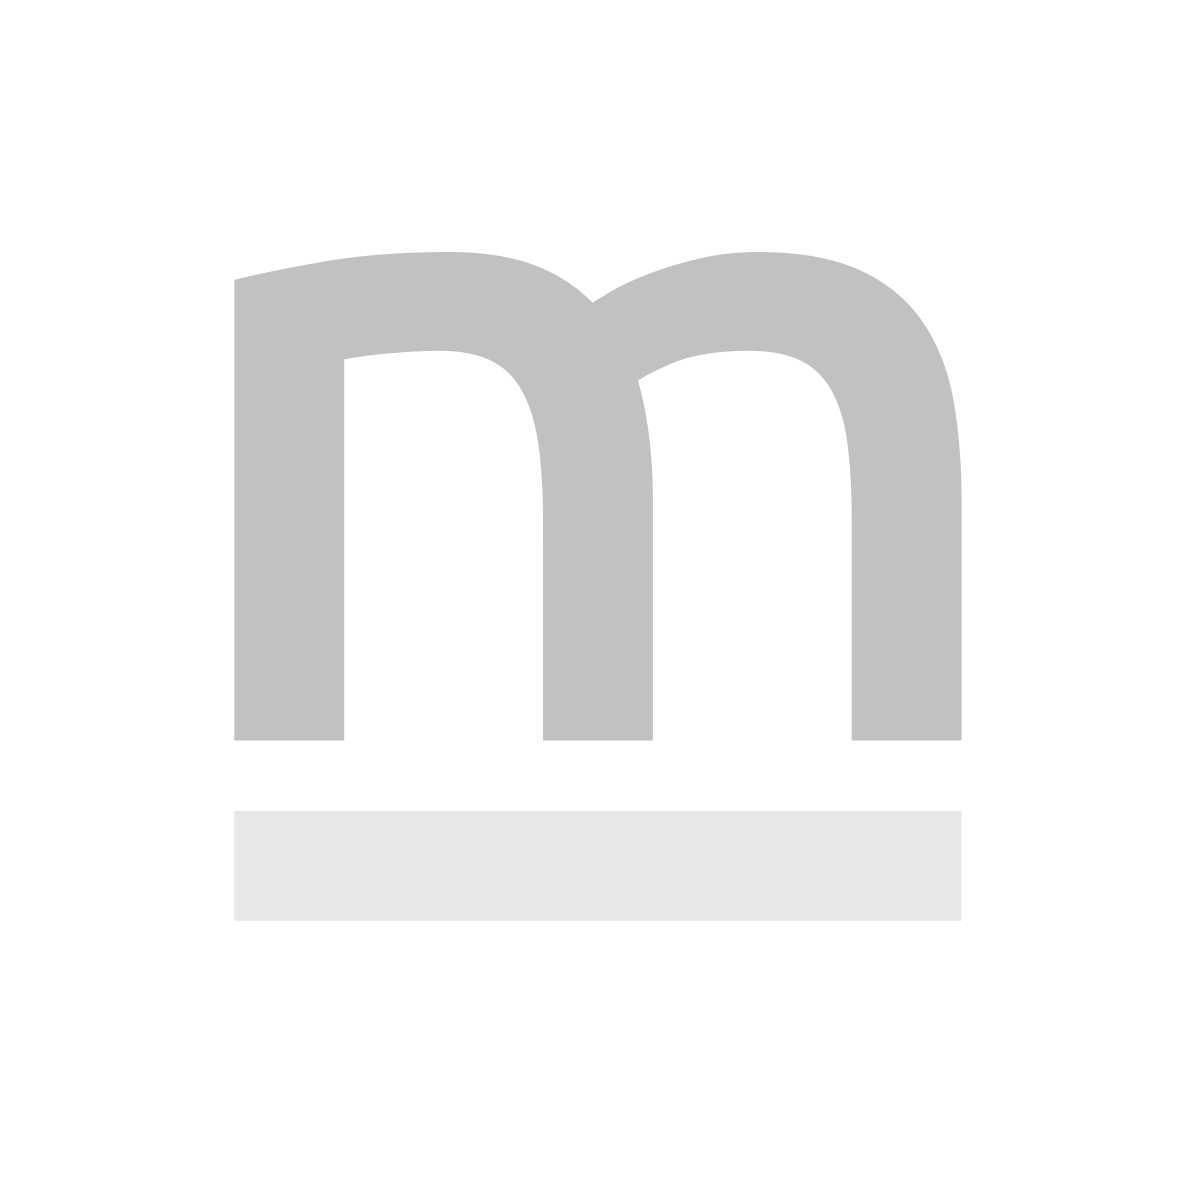 Parawan 5-częściowy - Różowa magnolia II [Room Dividers]